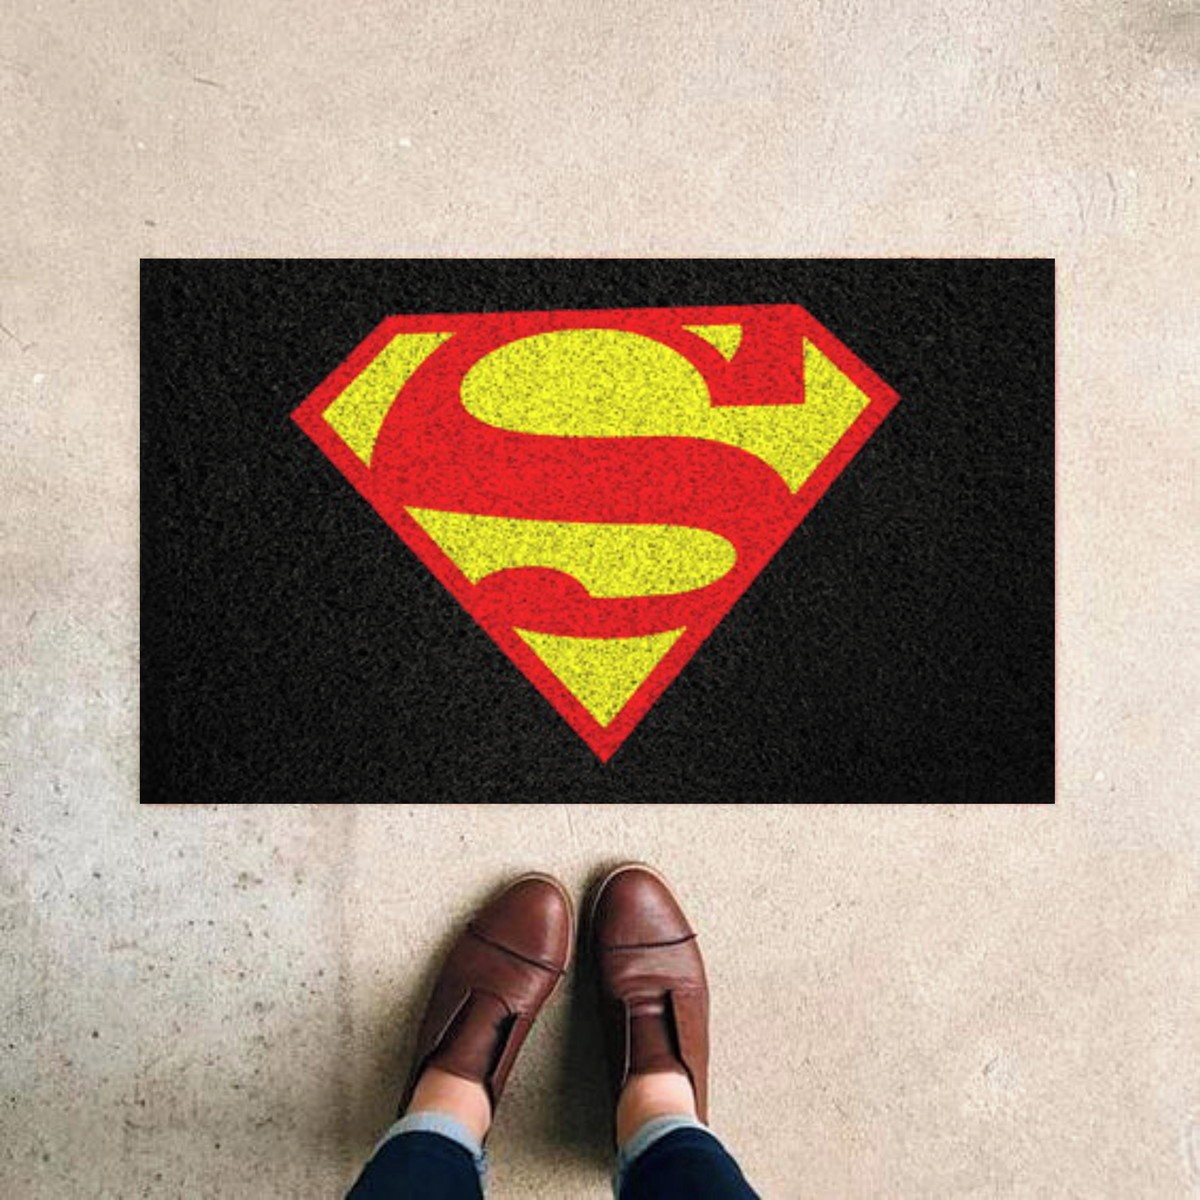 Tapete Capacho Super Homem